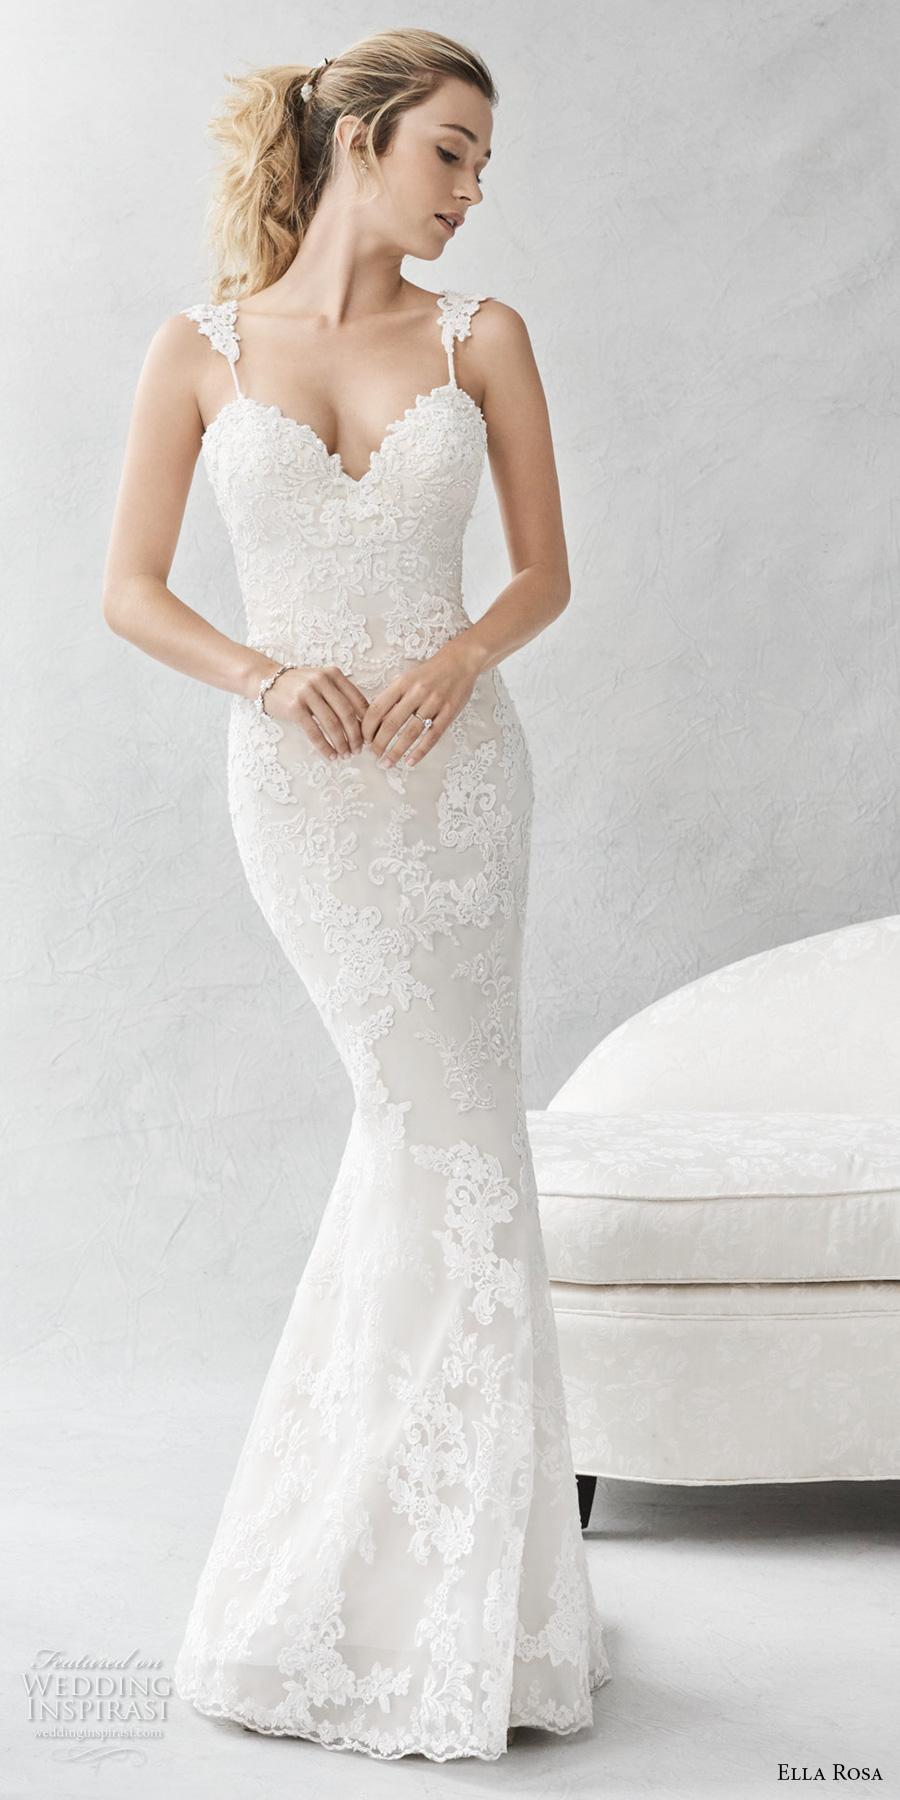 ella rosa spring 2017 bridal sleeveless embroidered strap sweetheart neckline full embellishment elegant fit and flare wedding dress open back small train (384) mv